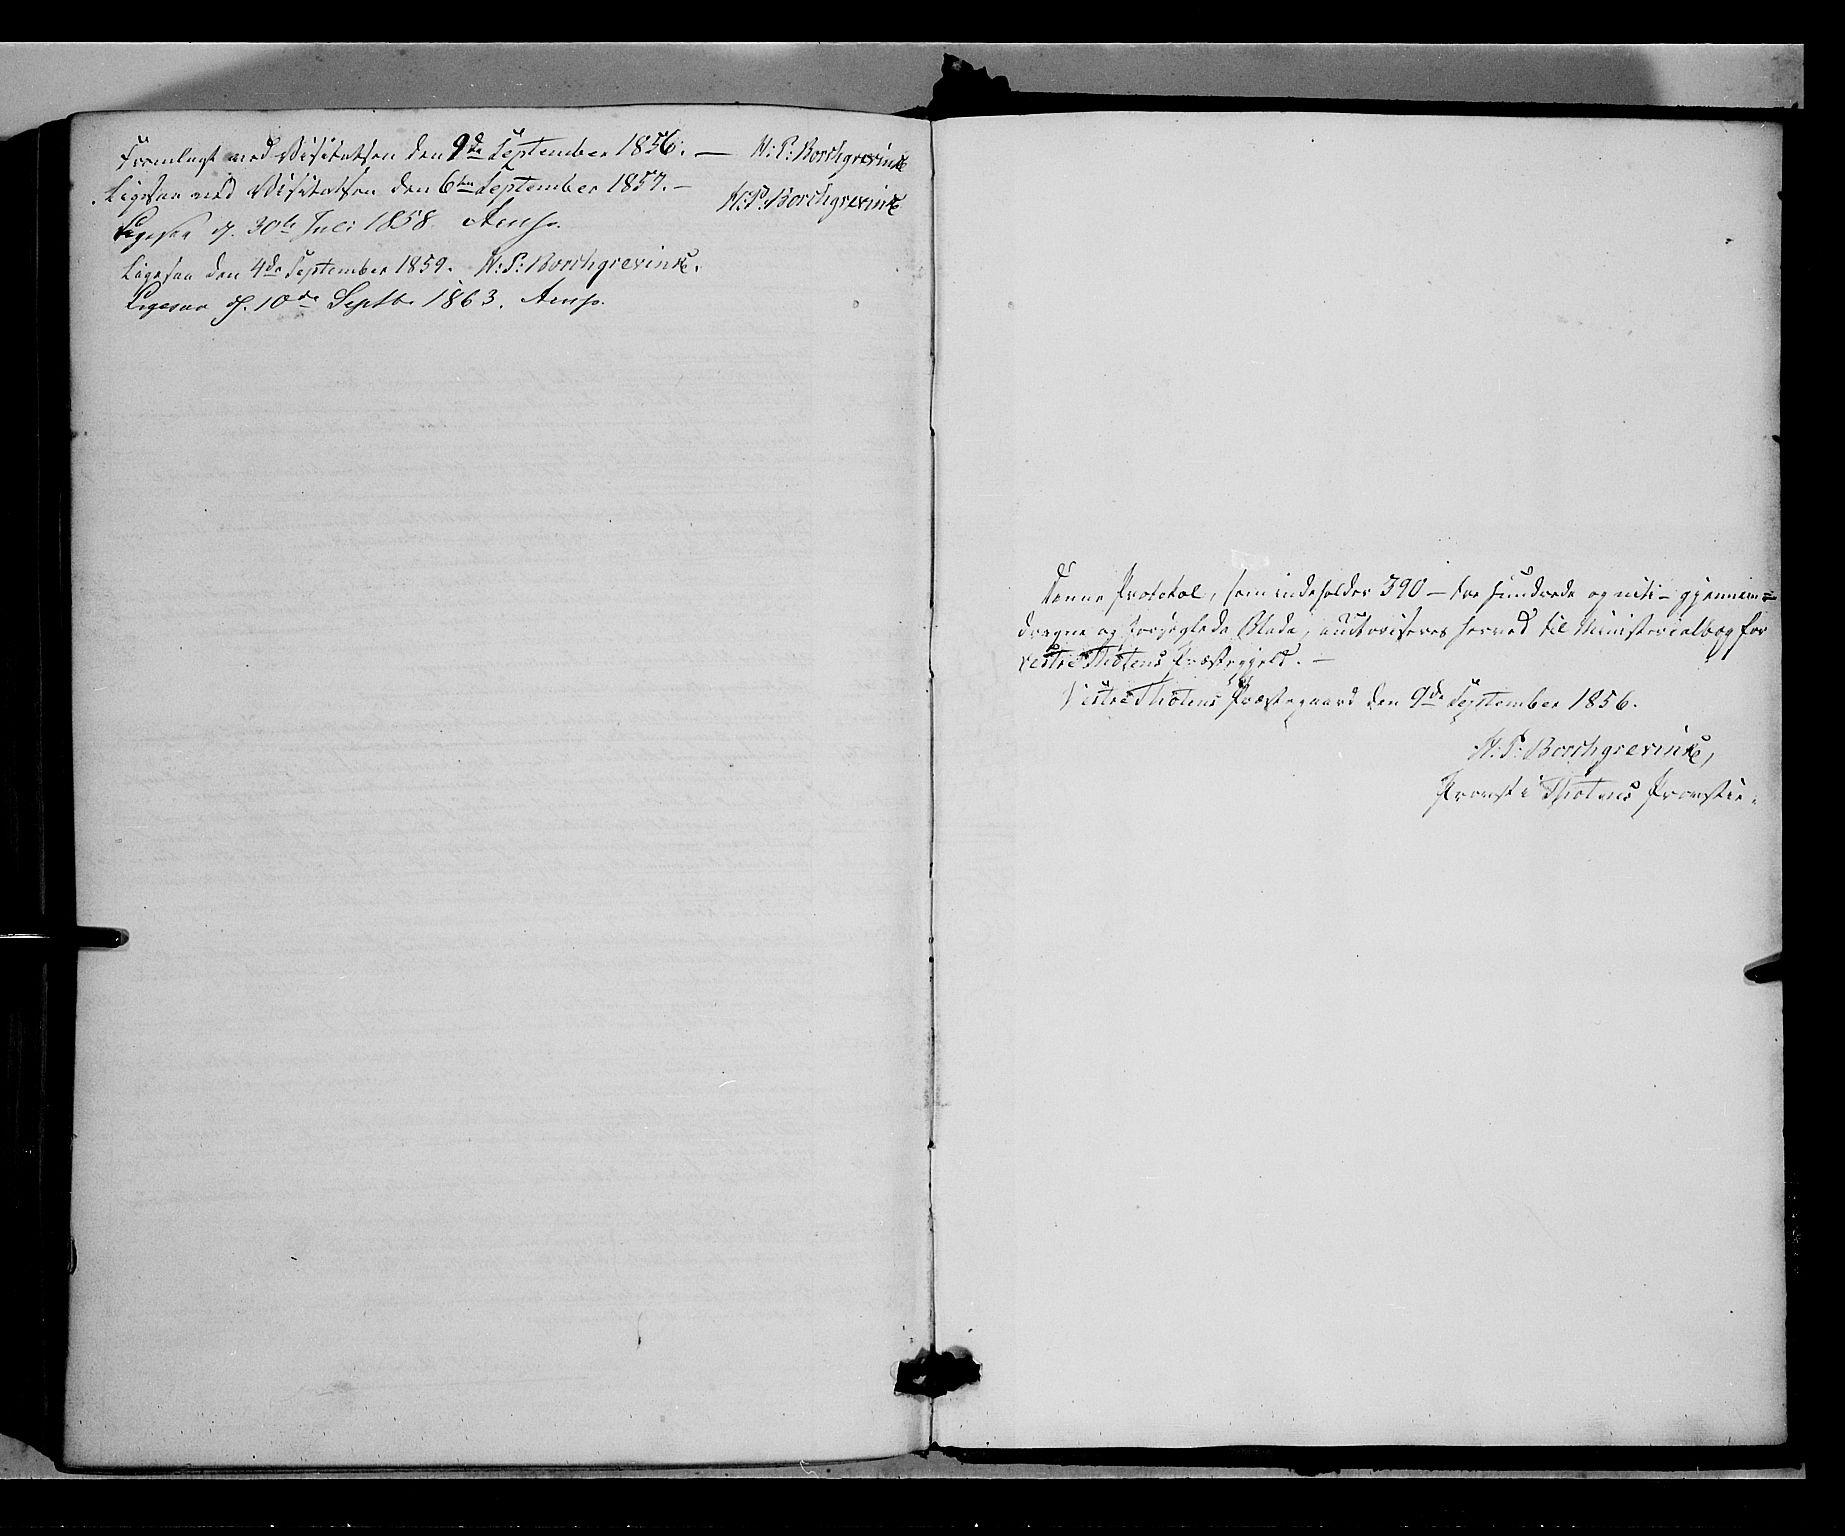 SAH, Vestre Toten prestekontor, Ministerialbok nr. 6, 1856-1861